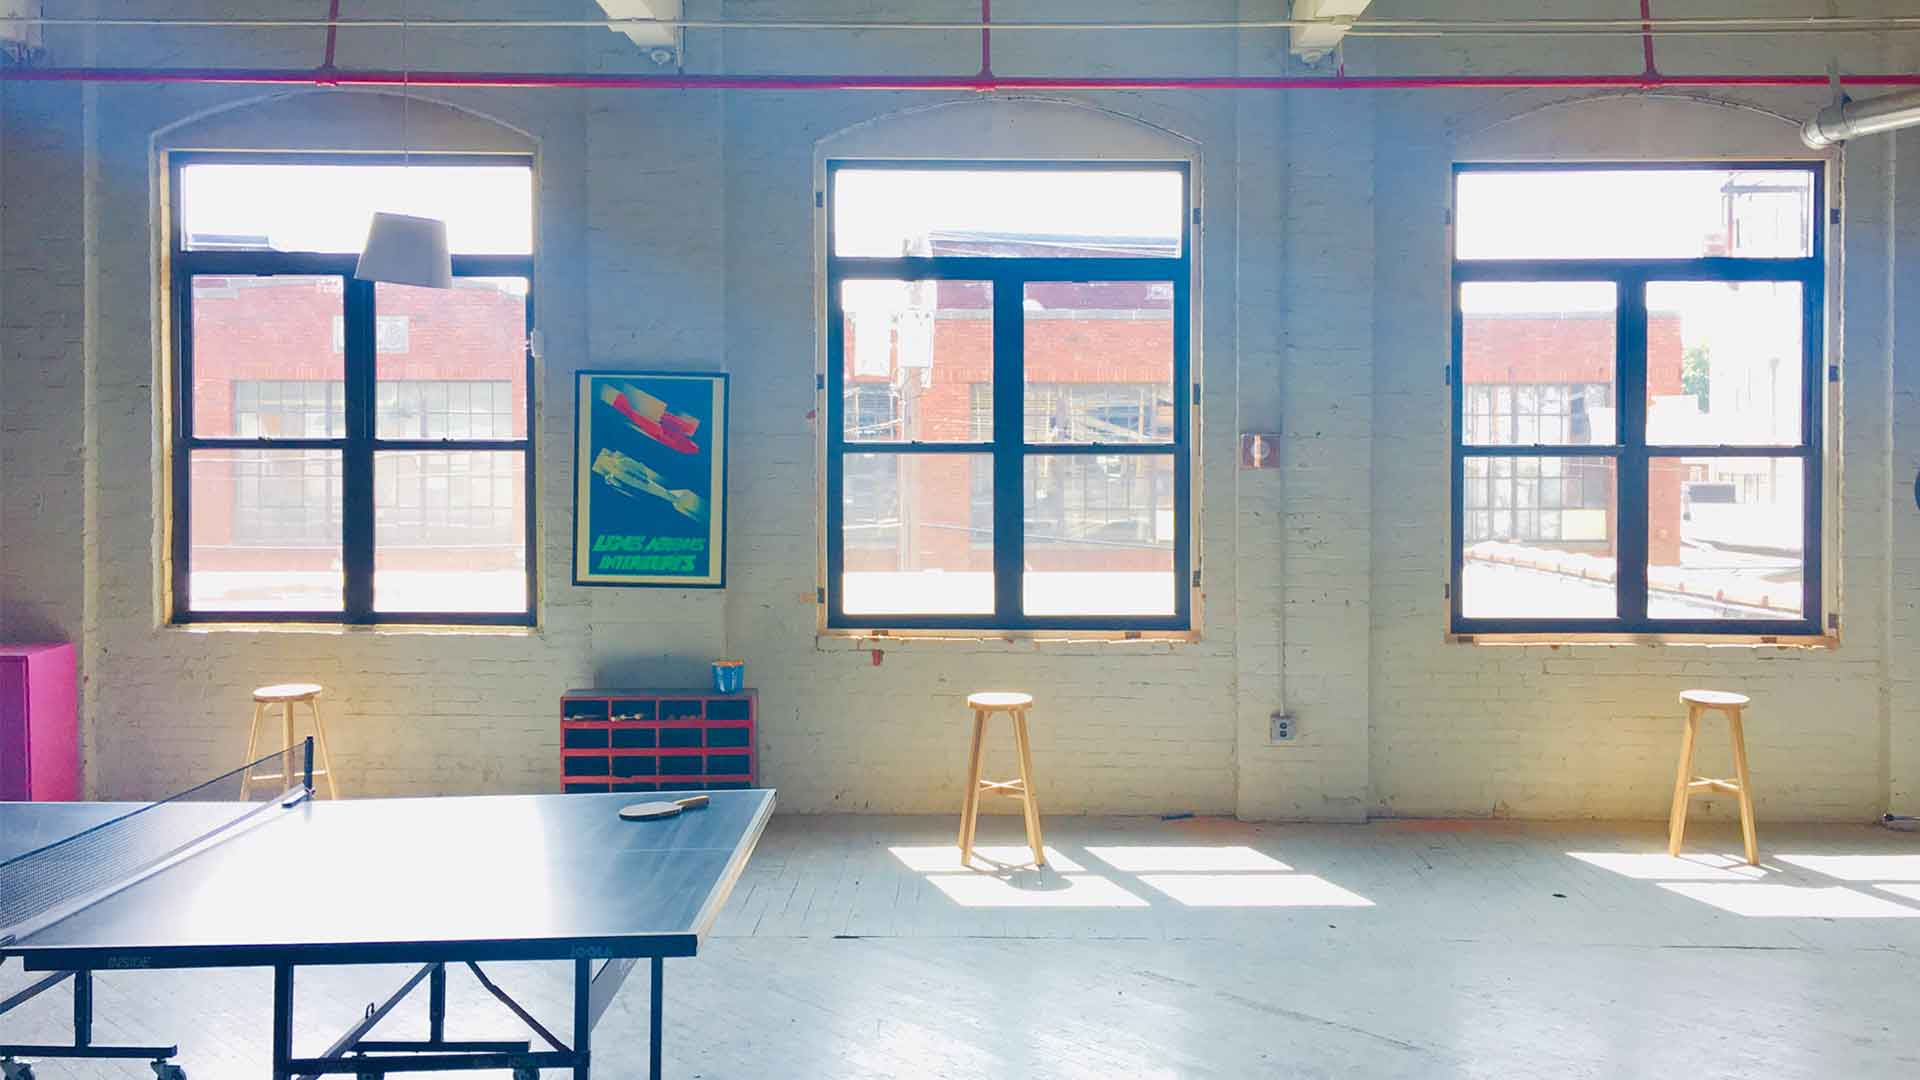 NJ Epic Studio and Event Space Windows